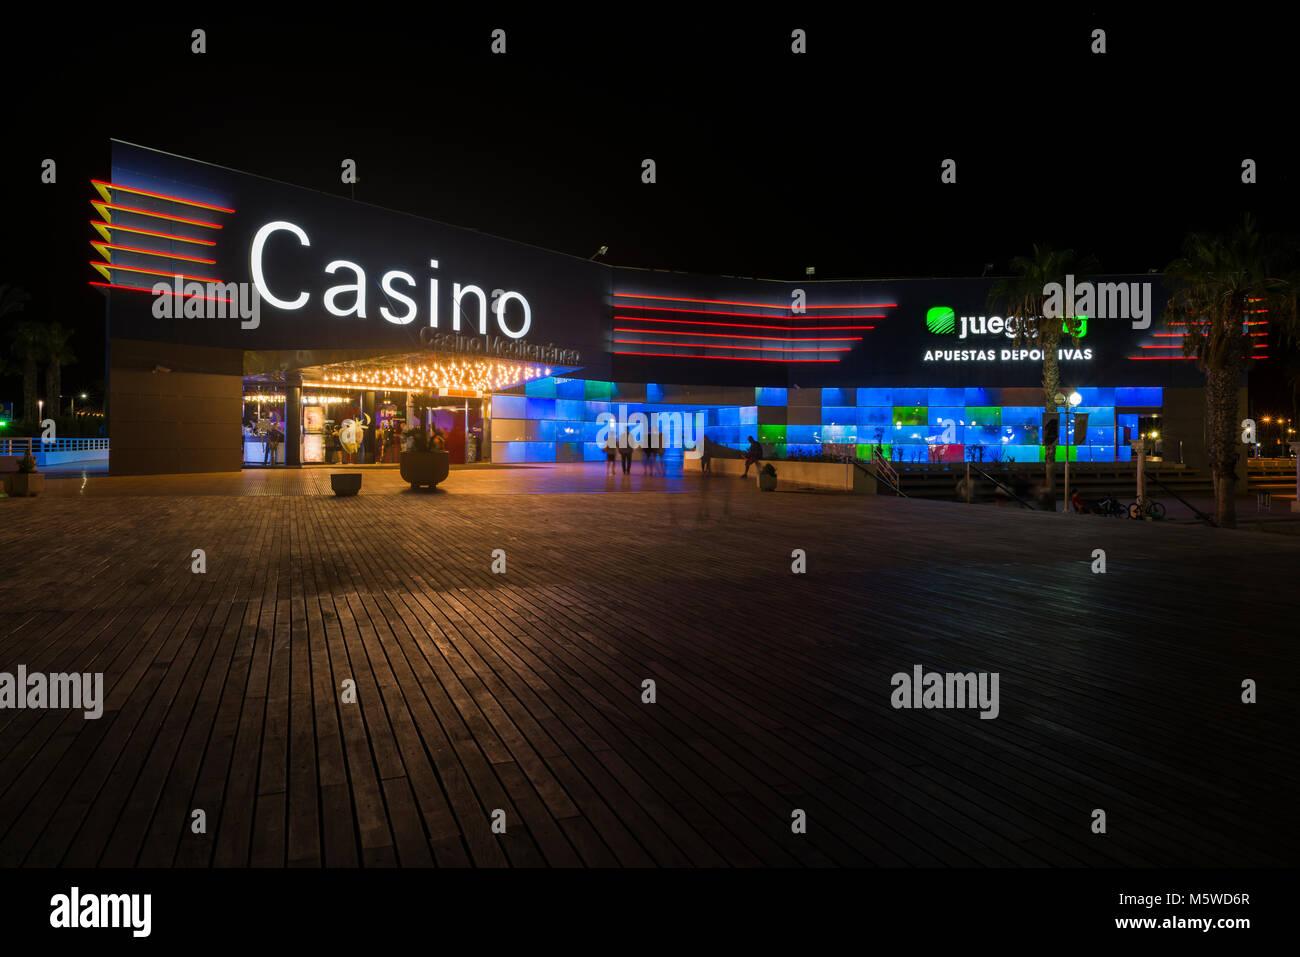 Spain casino city canada casinos jobs